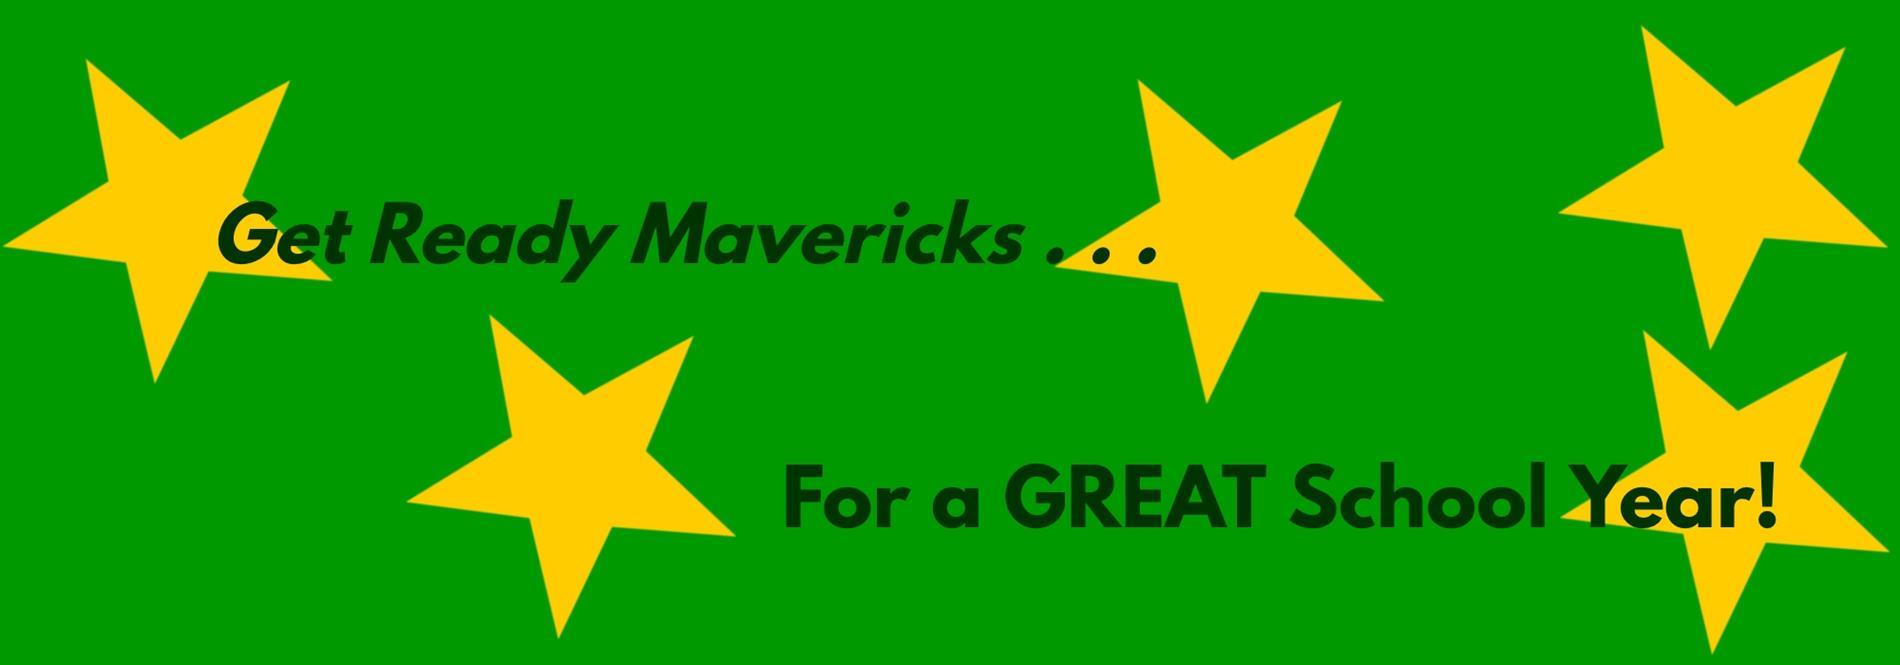 Get Ready Mavericks